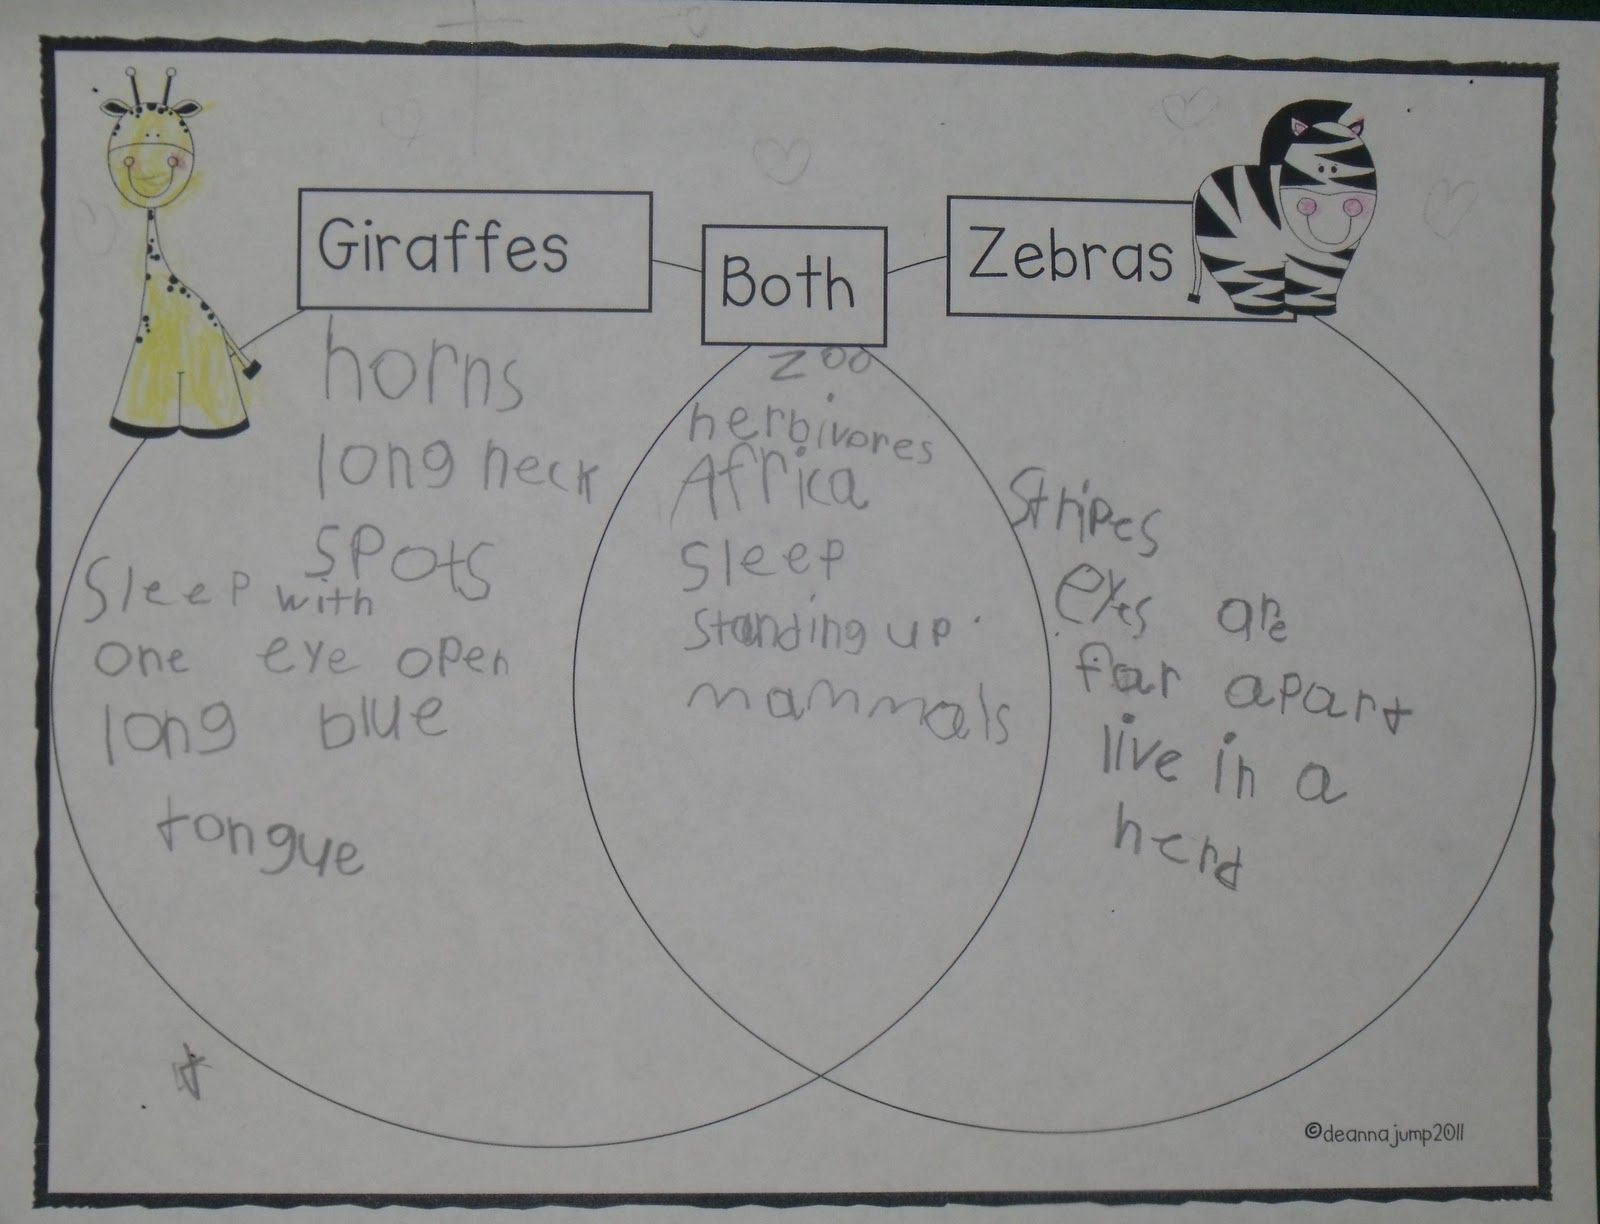 hight resolution of zoo venn diagram comparing giraffes and zebras